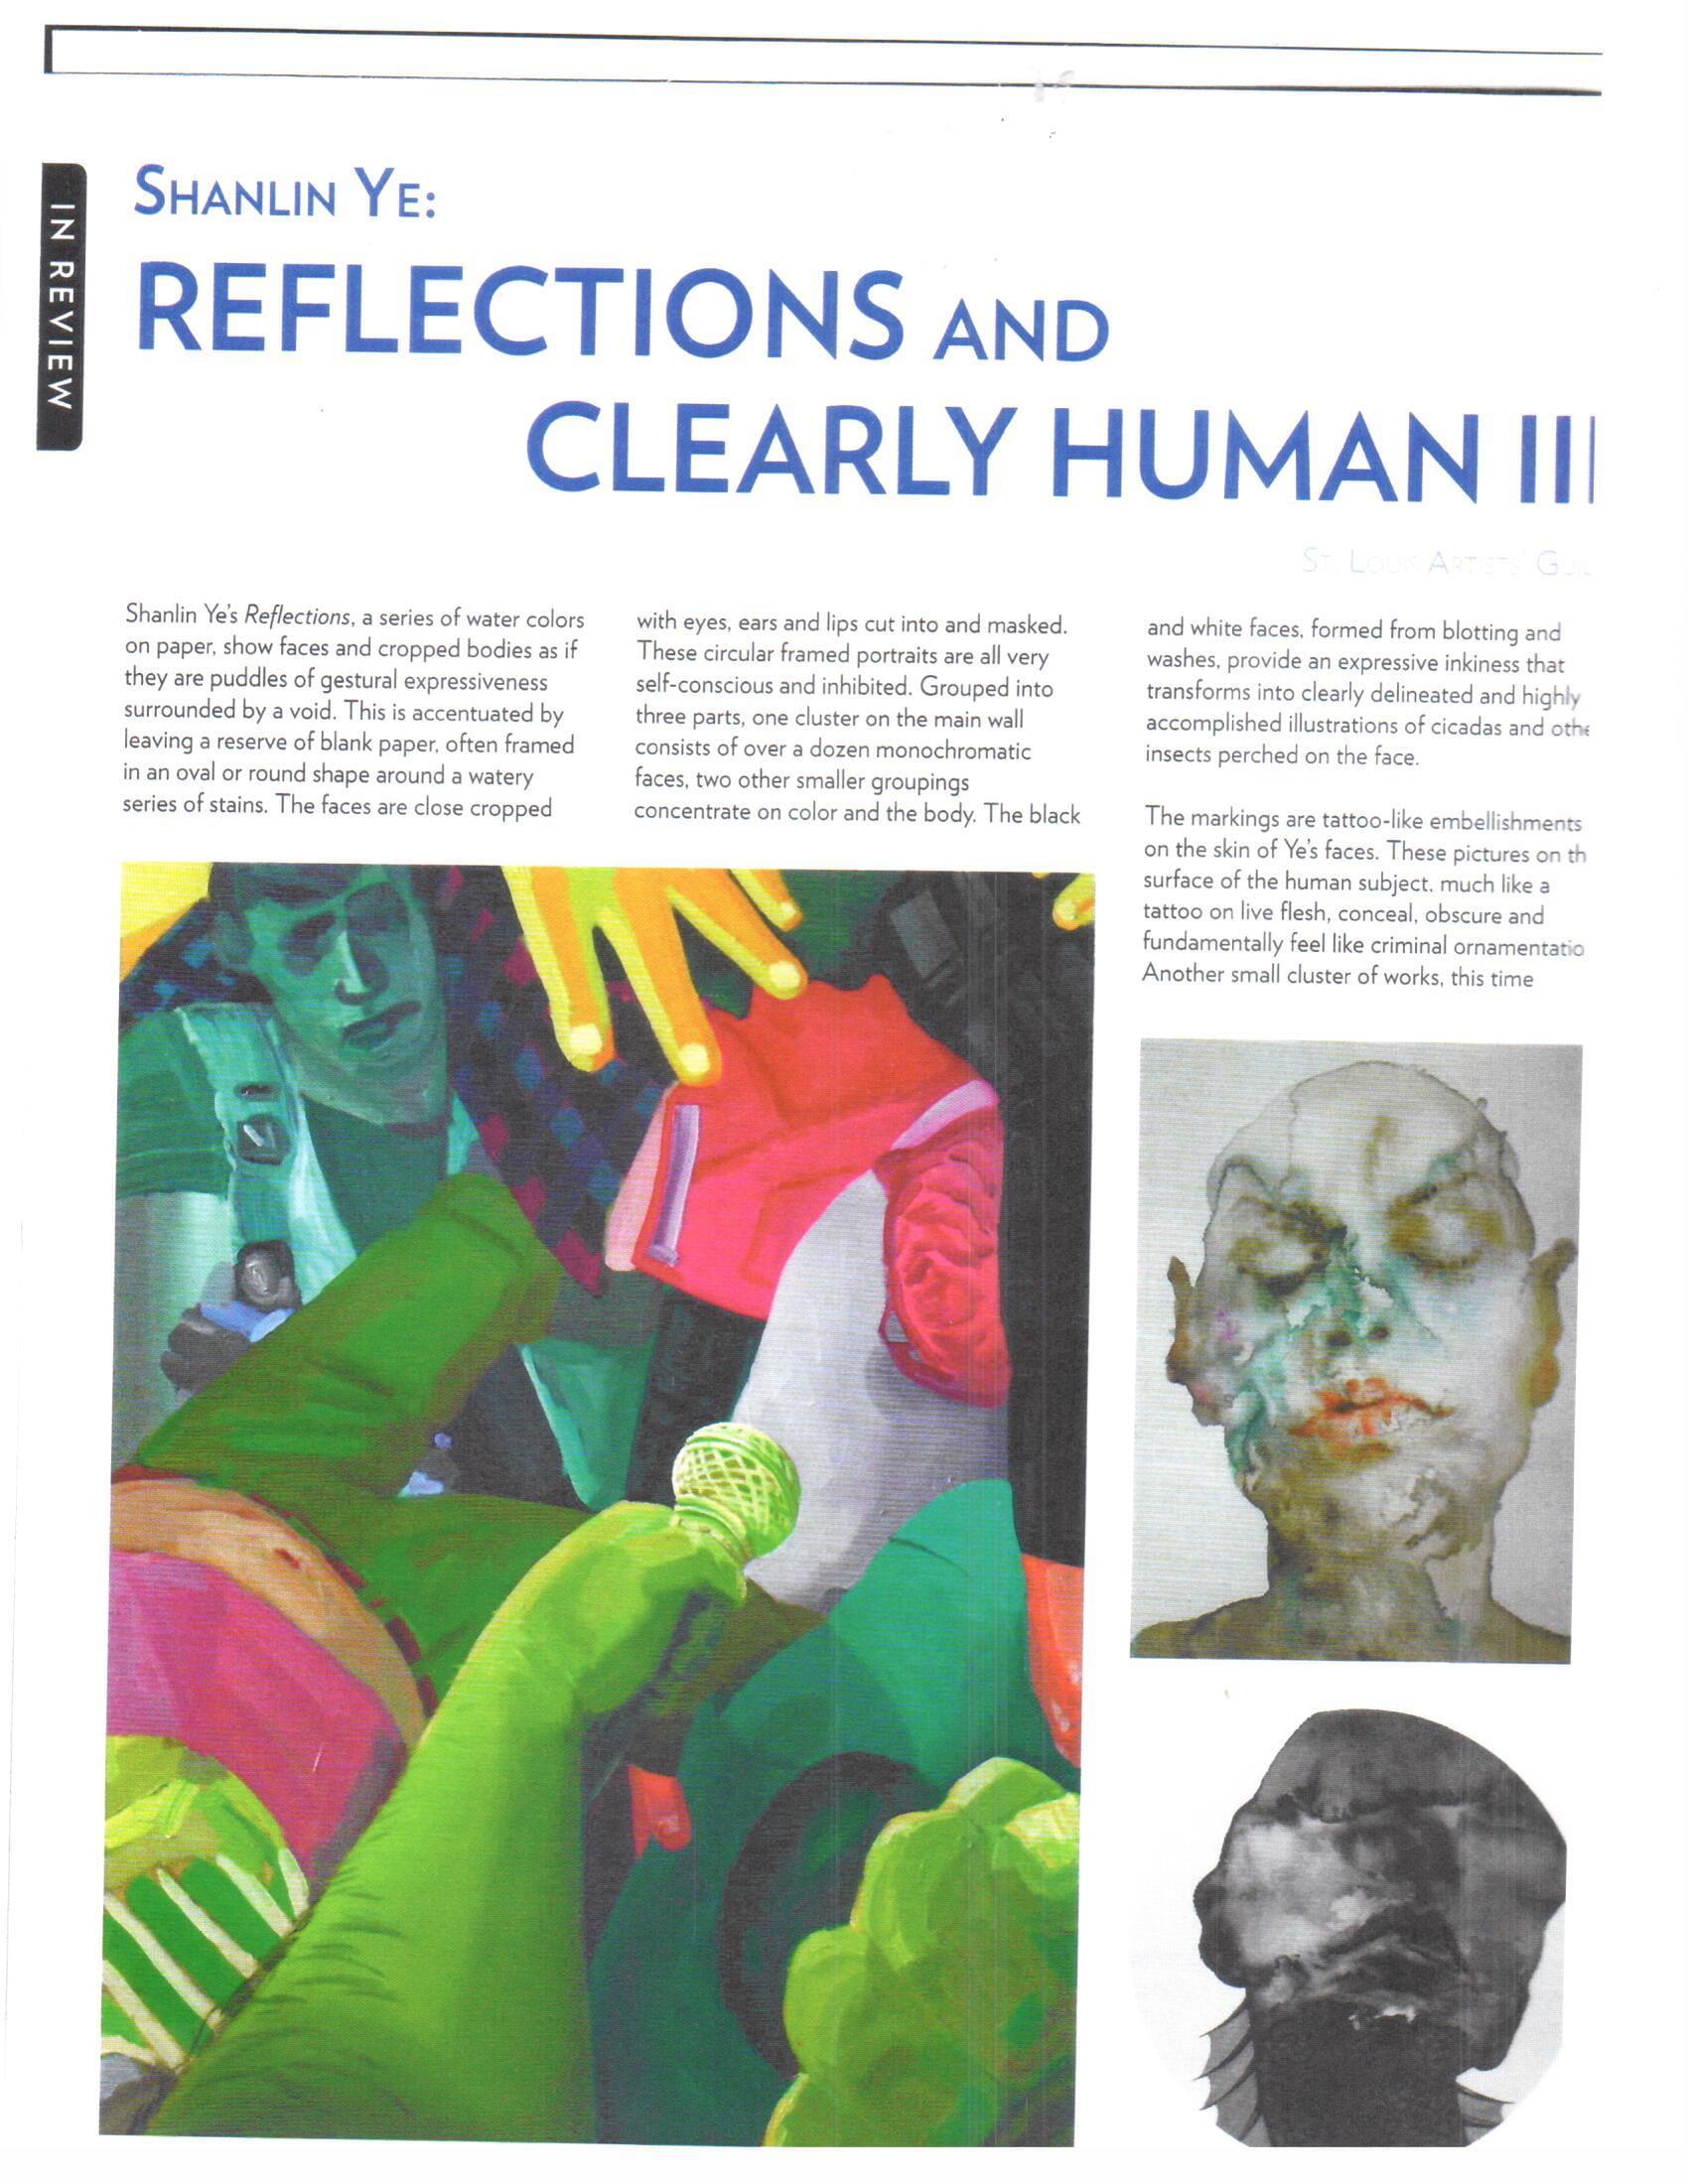 St. Louis Visual Arts Quarterly (2018 Fall) Featuring Shanlin Ye-1.jpg